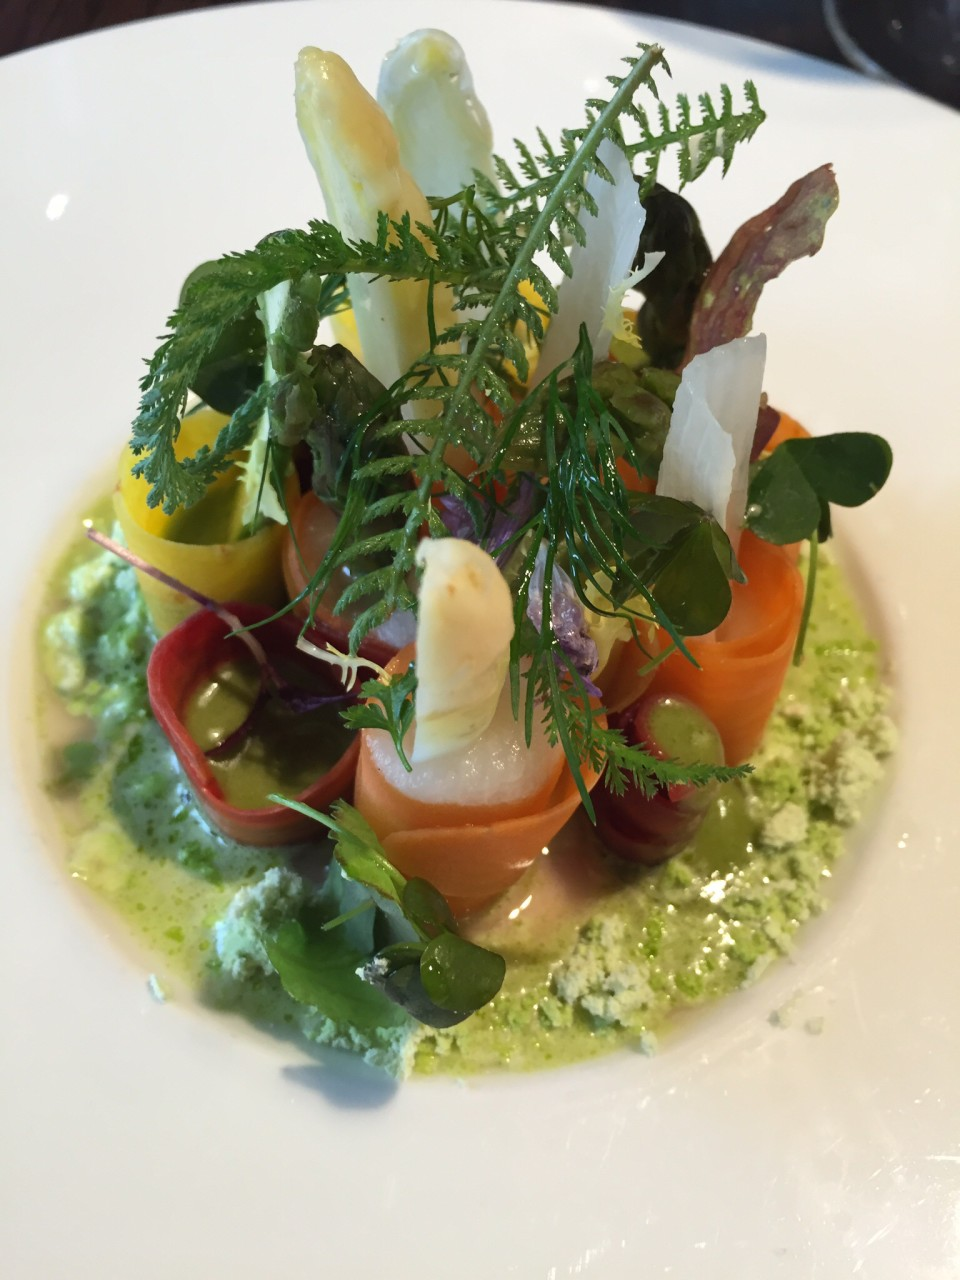 Mlynec Prague – Asparagus & Carrot Salad with Lime and Mint Dust